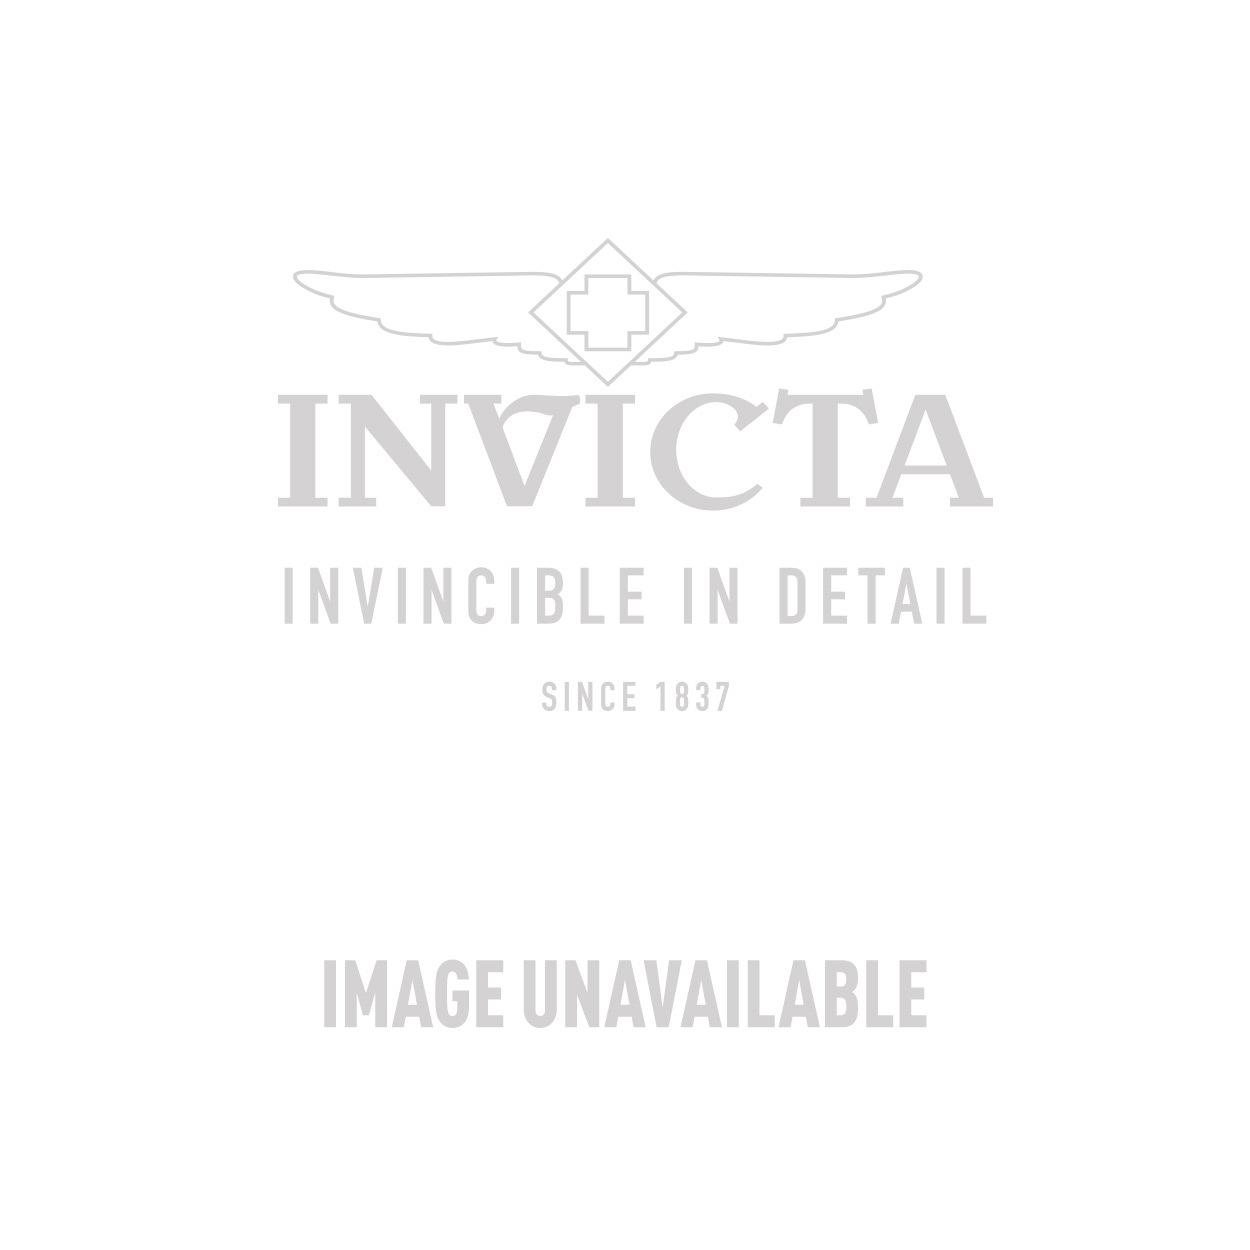 Invicta Ocean Reef  Quartz Watch - Black, Gunmetal case with Black, Gunmetal tone Stainless Steel, Polyurethane band - Model 16865